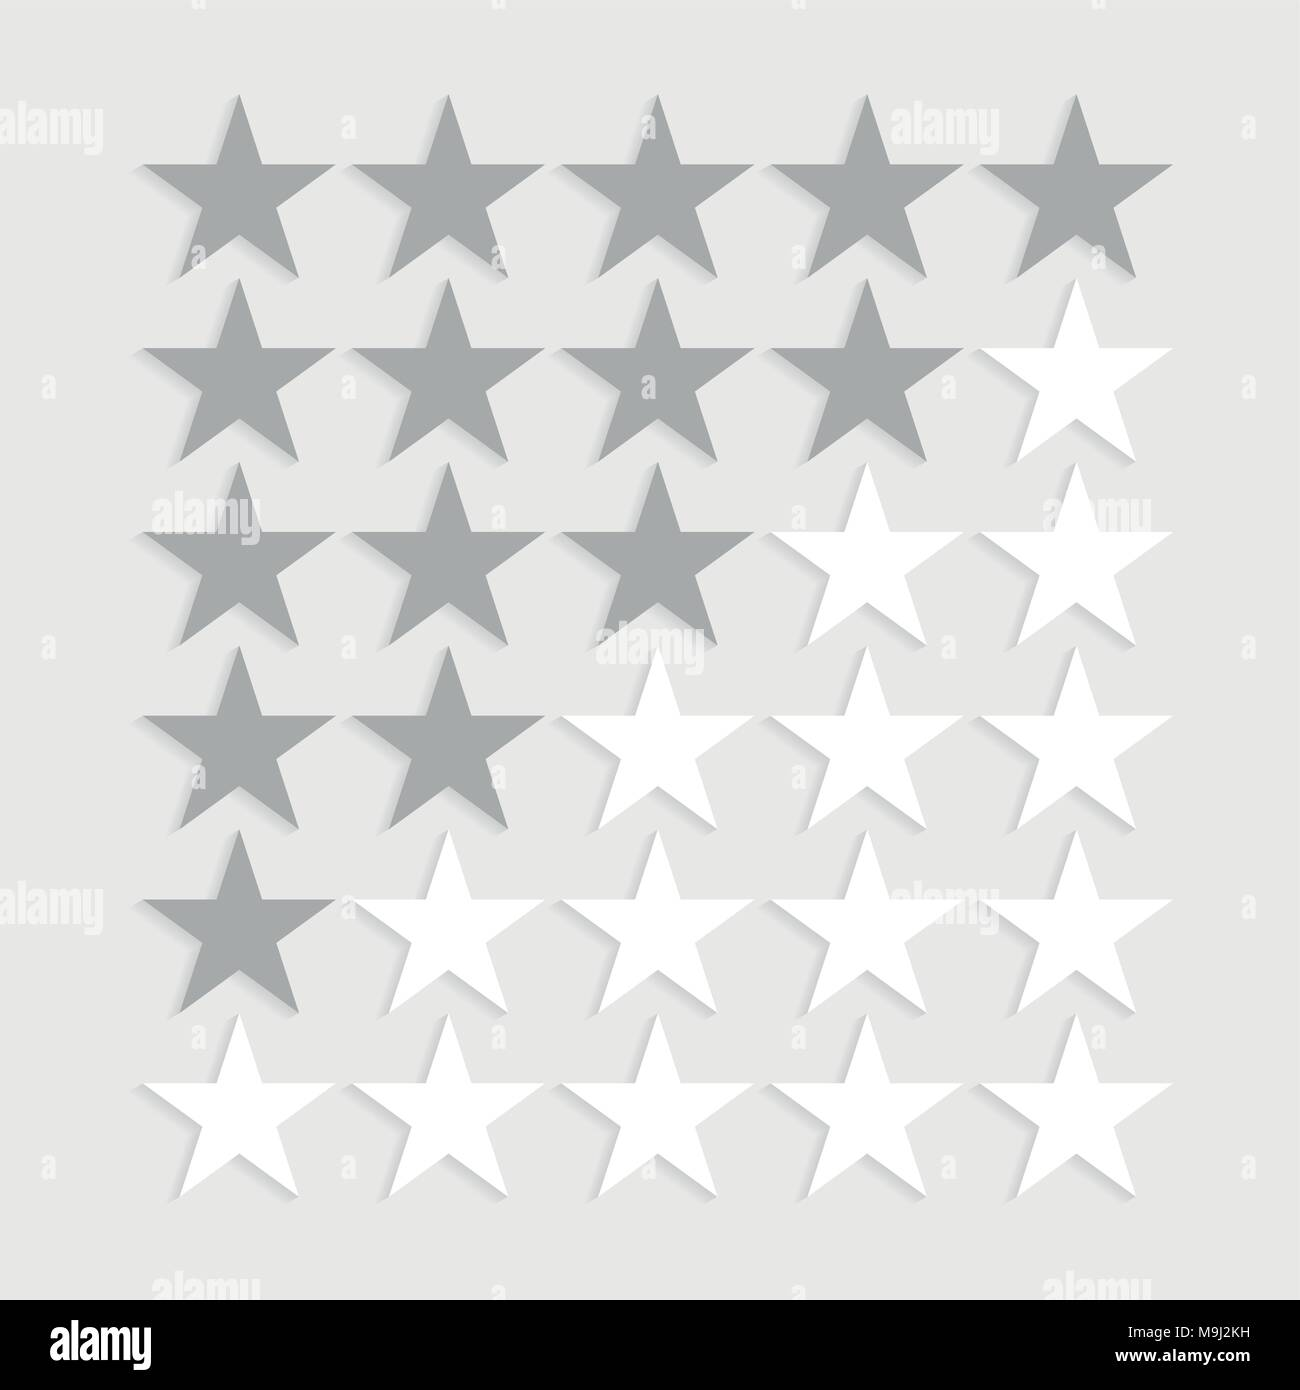 Star rating symbols. Stock Vector